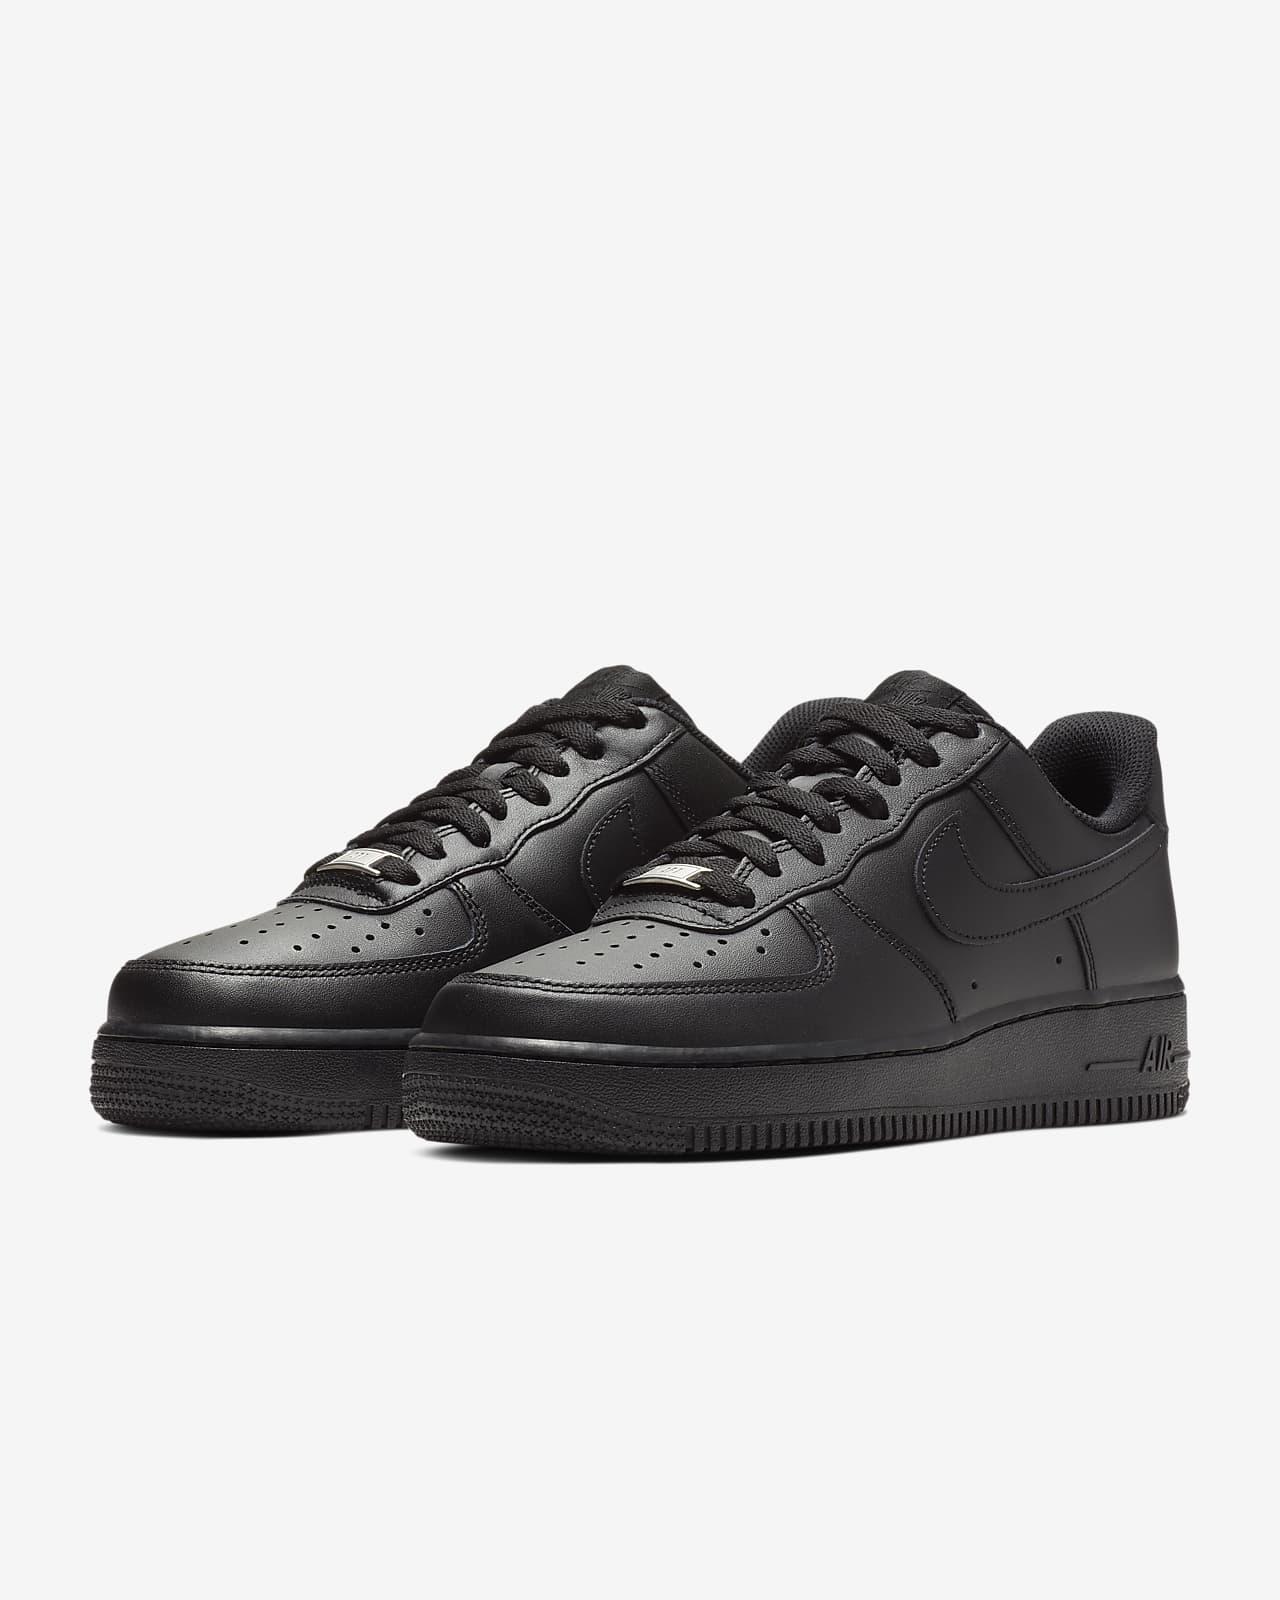 zapatillas air force 1 negras